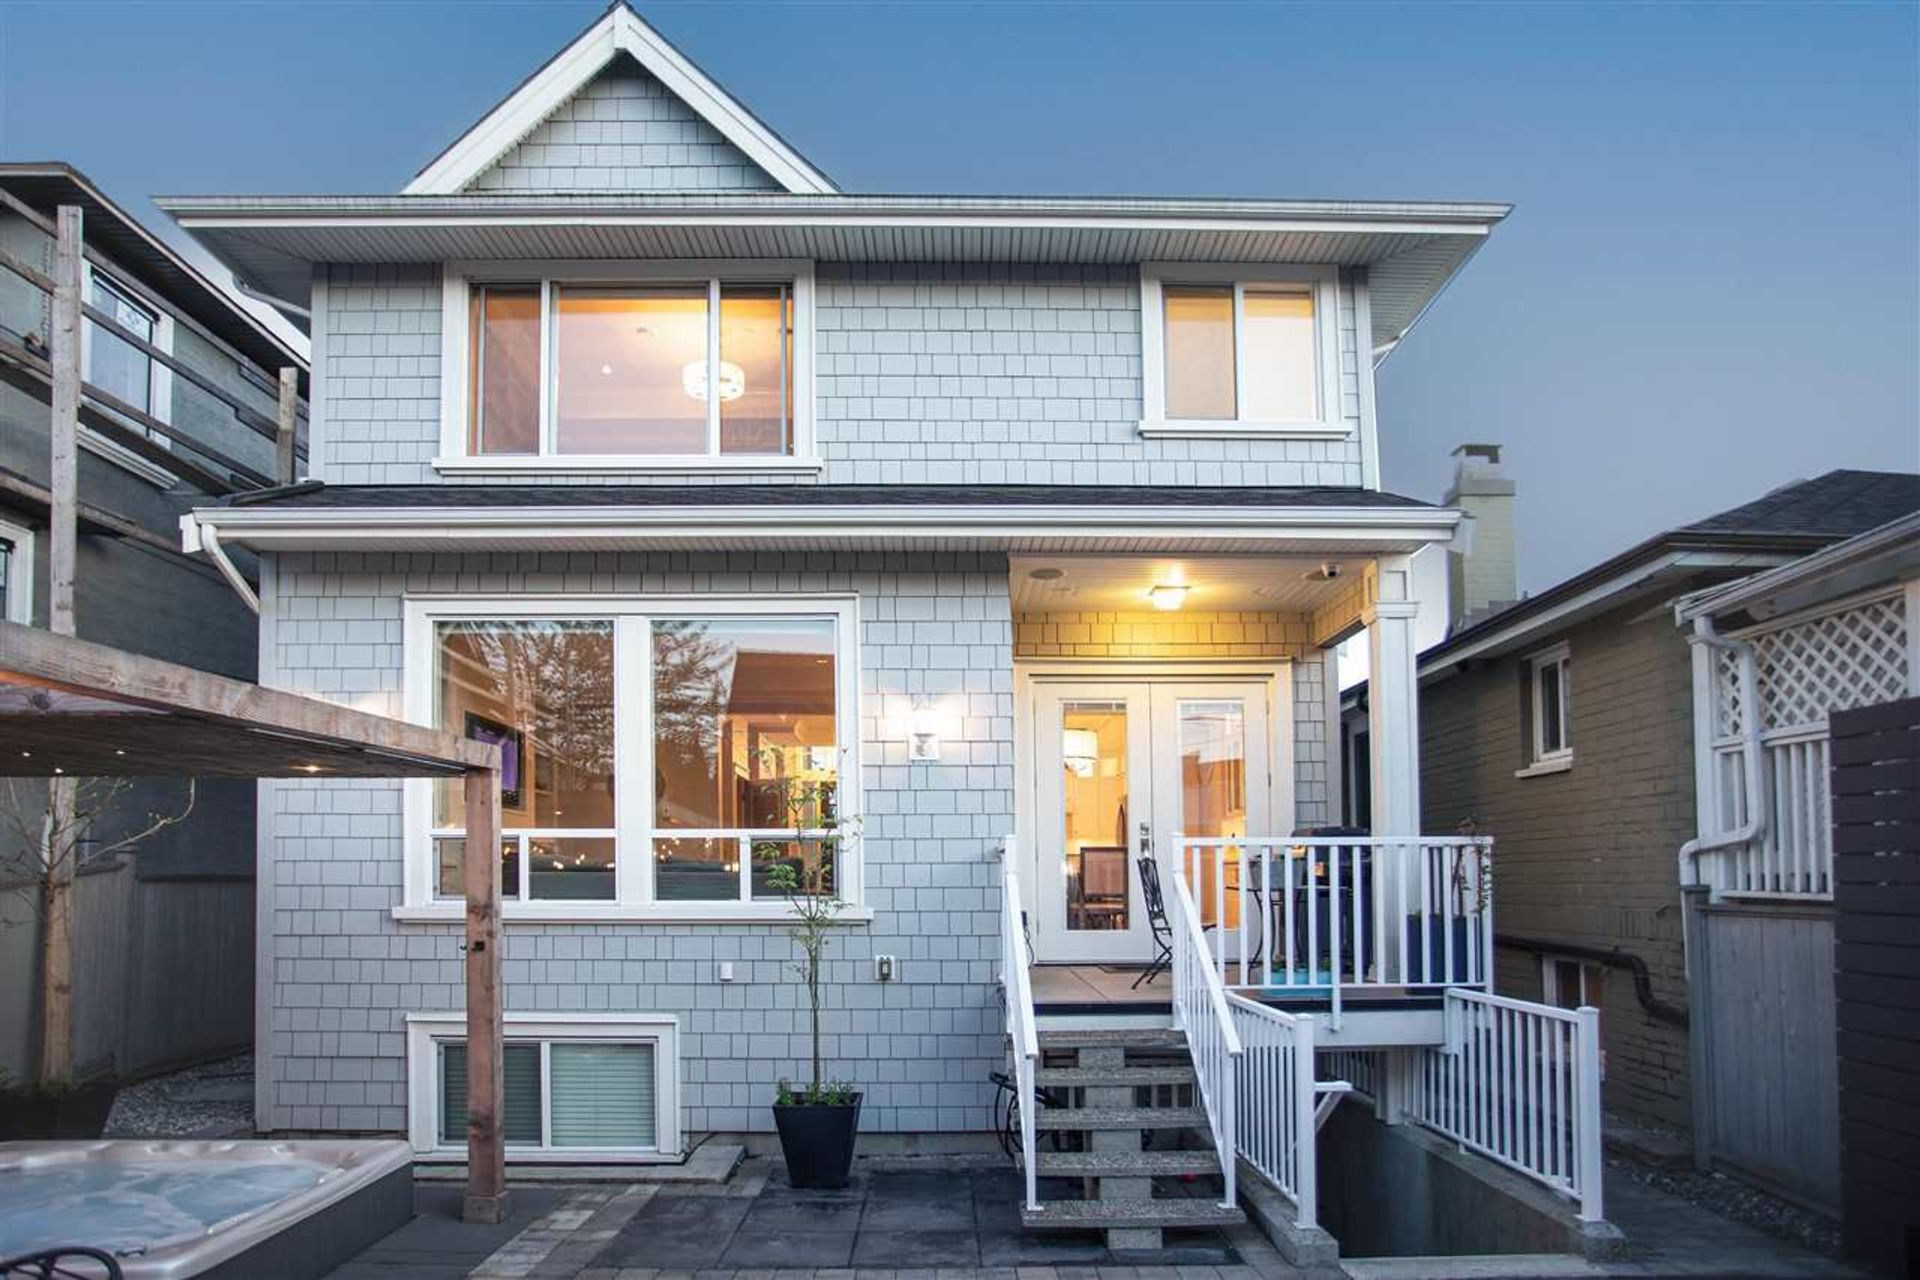 3535-dundas-street-hastings-sunrise-vancouver-east-38 at 3535 Dundas Street, Hastings Sunrise, Vancouver East